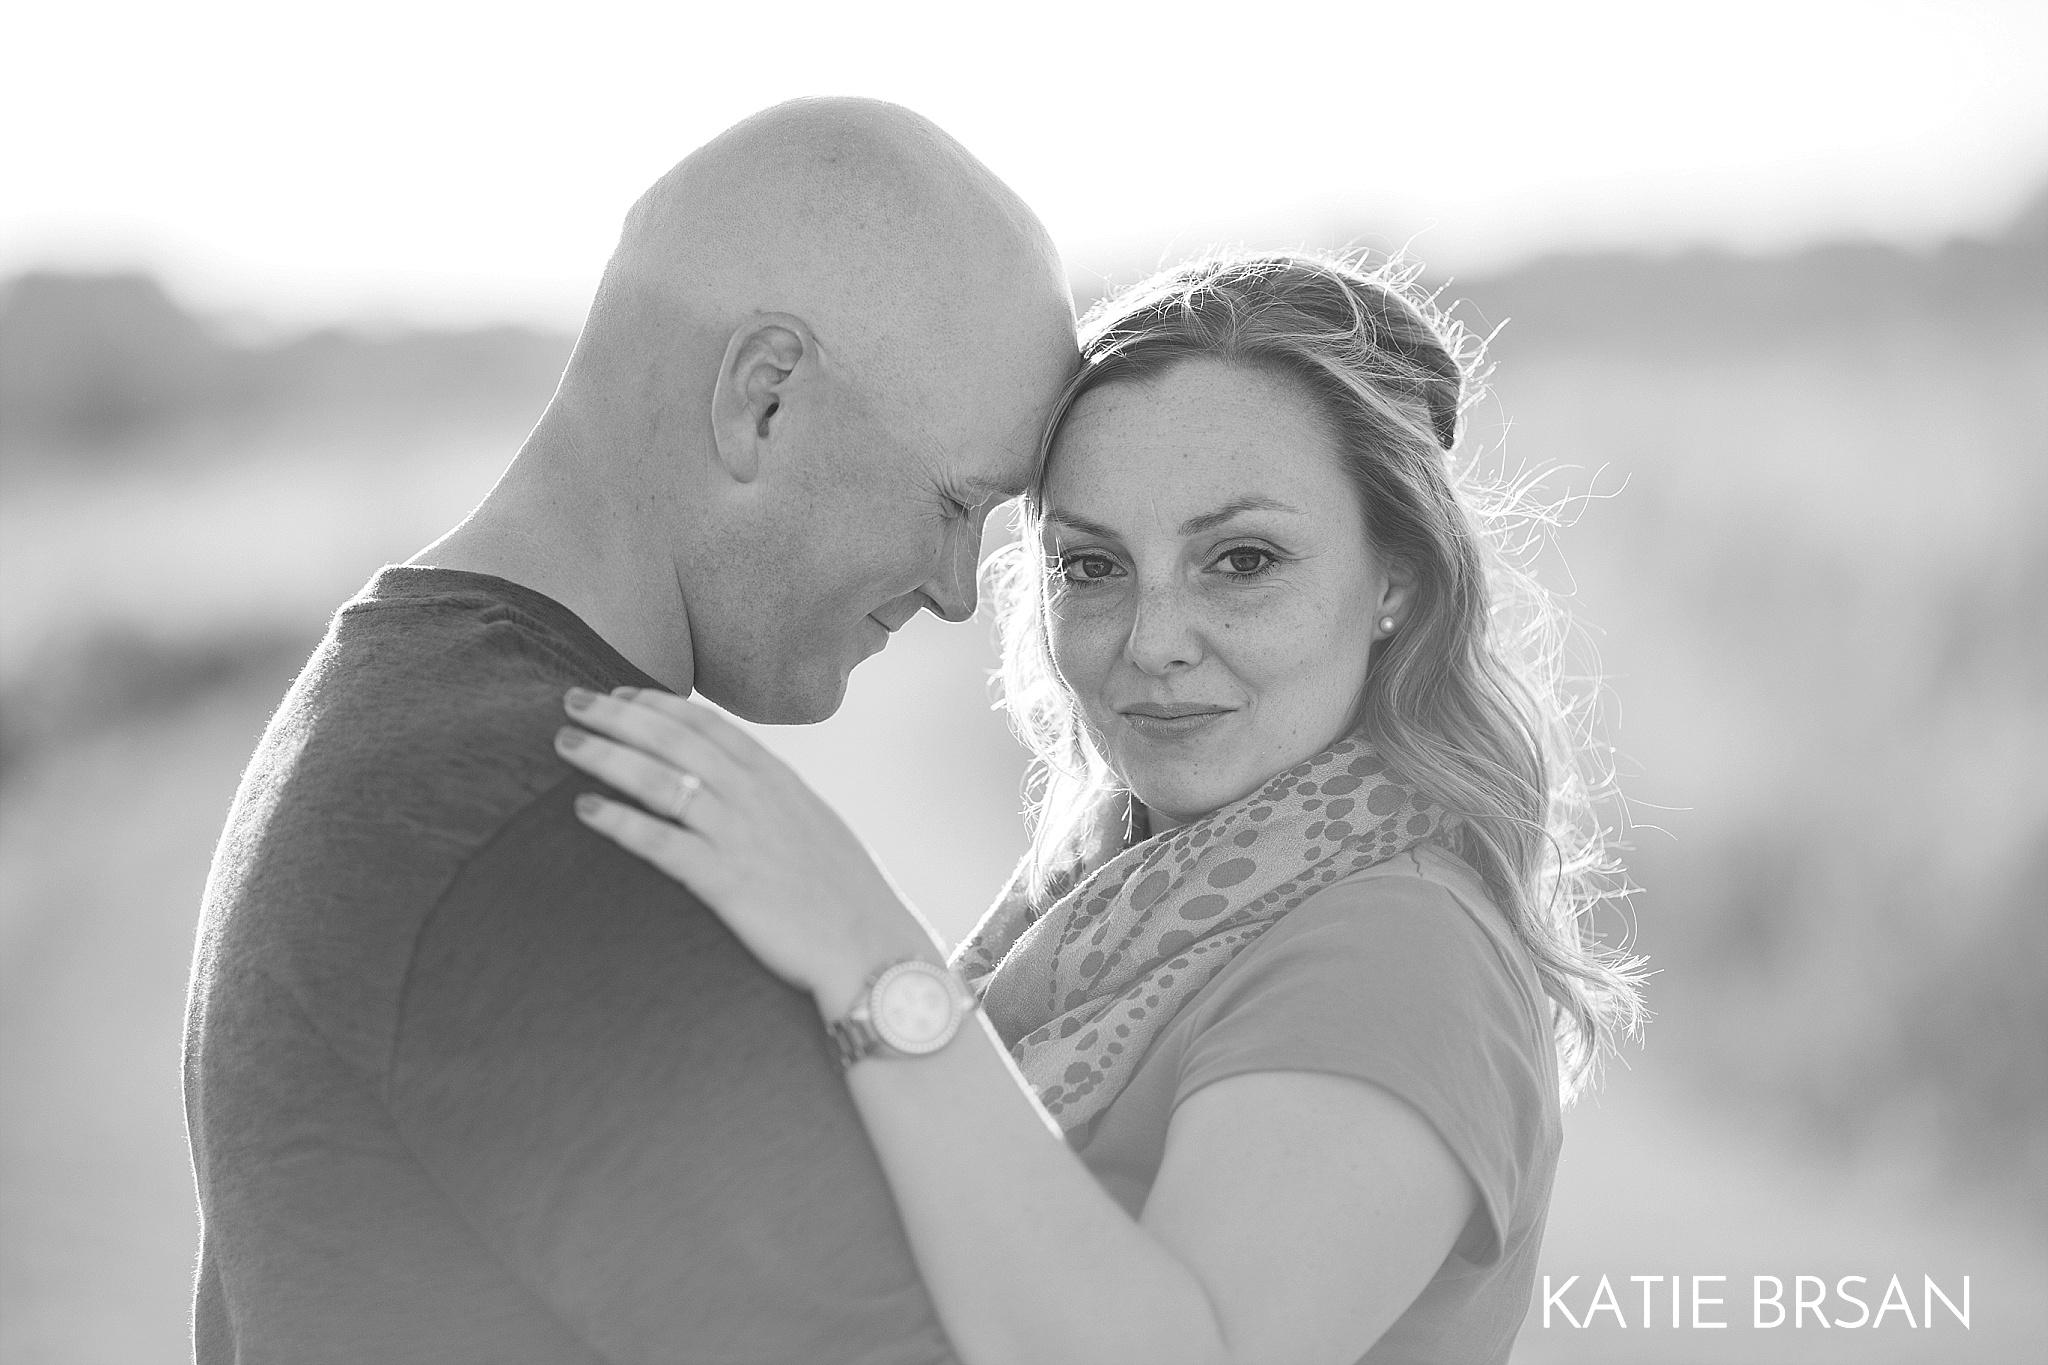 KatieBrsan-Chicago-Suburban-EngagementPictures-HadlyValley_0579.jpg